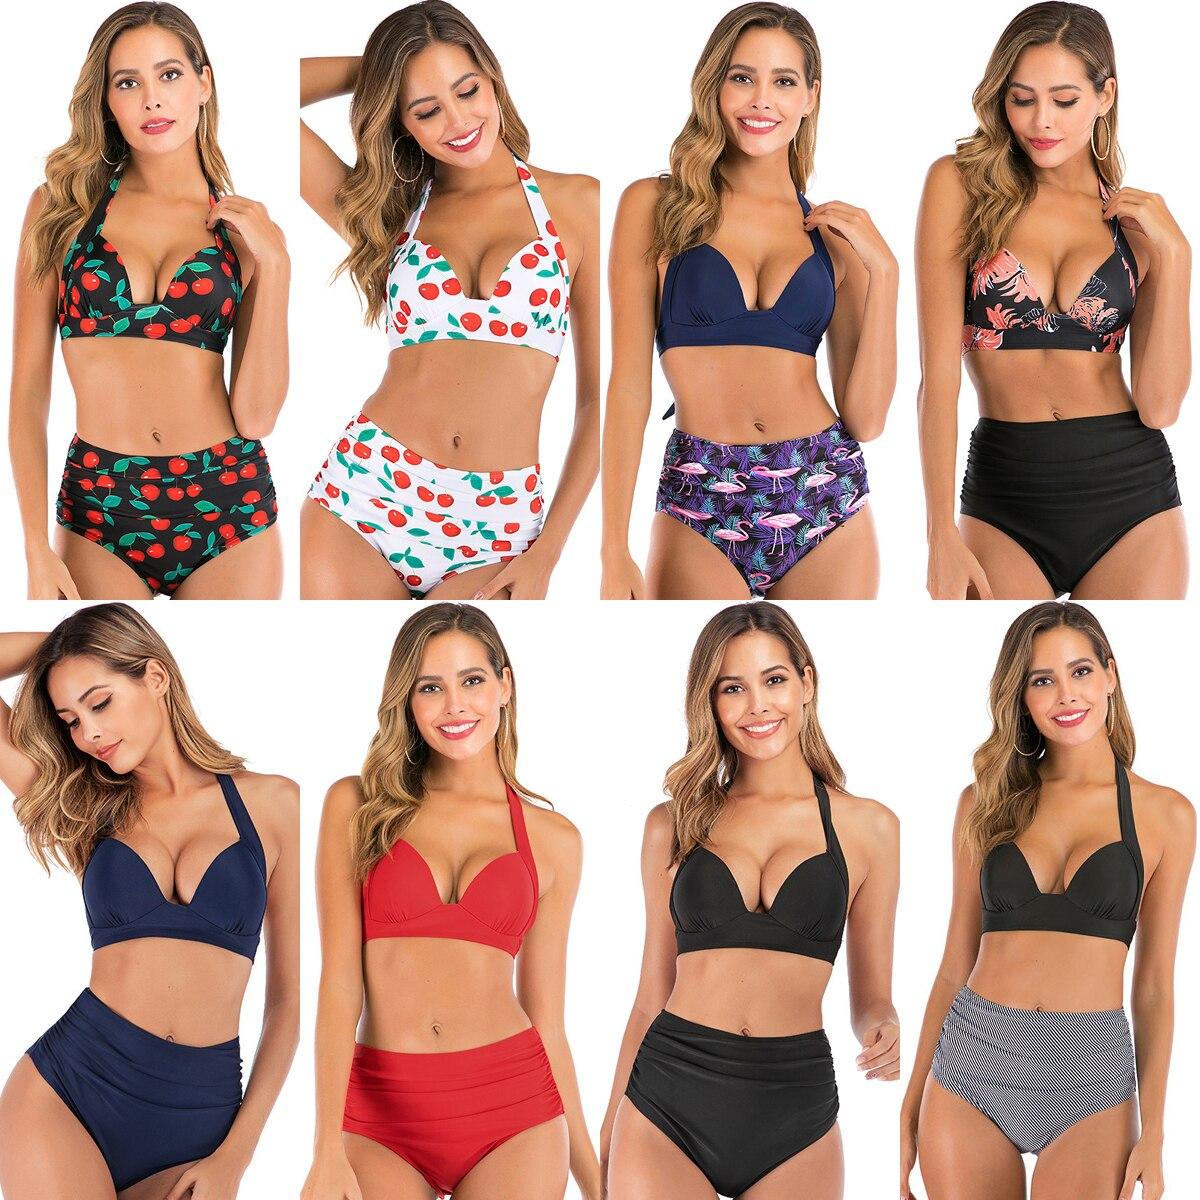 Hirigin Plus Size High Waist Bikini Set Women Swimwear 2020 New Halter Bandage Push Up Padded Swimsuit Women Bathing Suit Summer